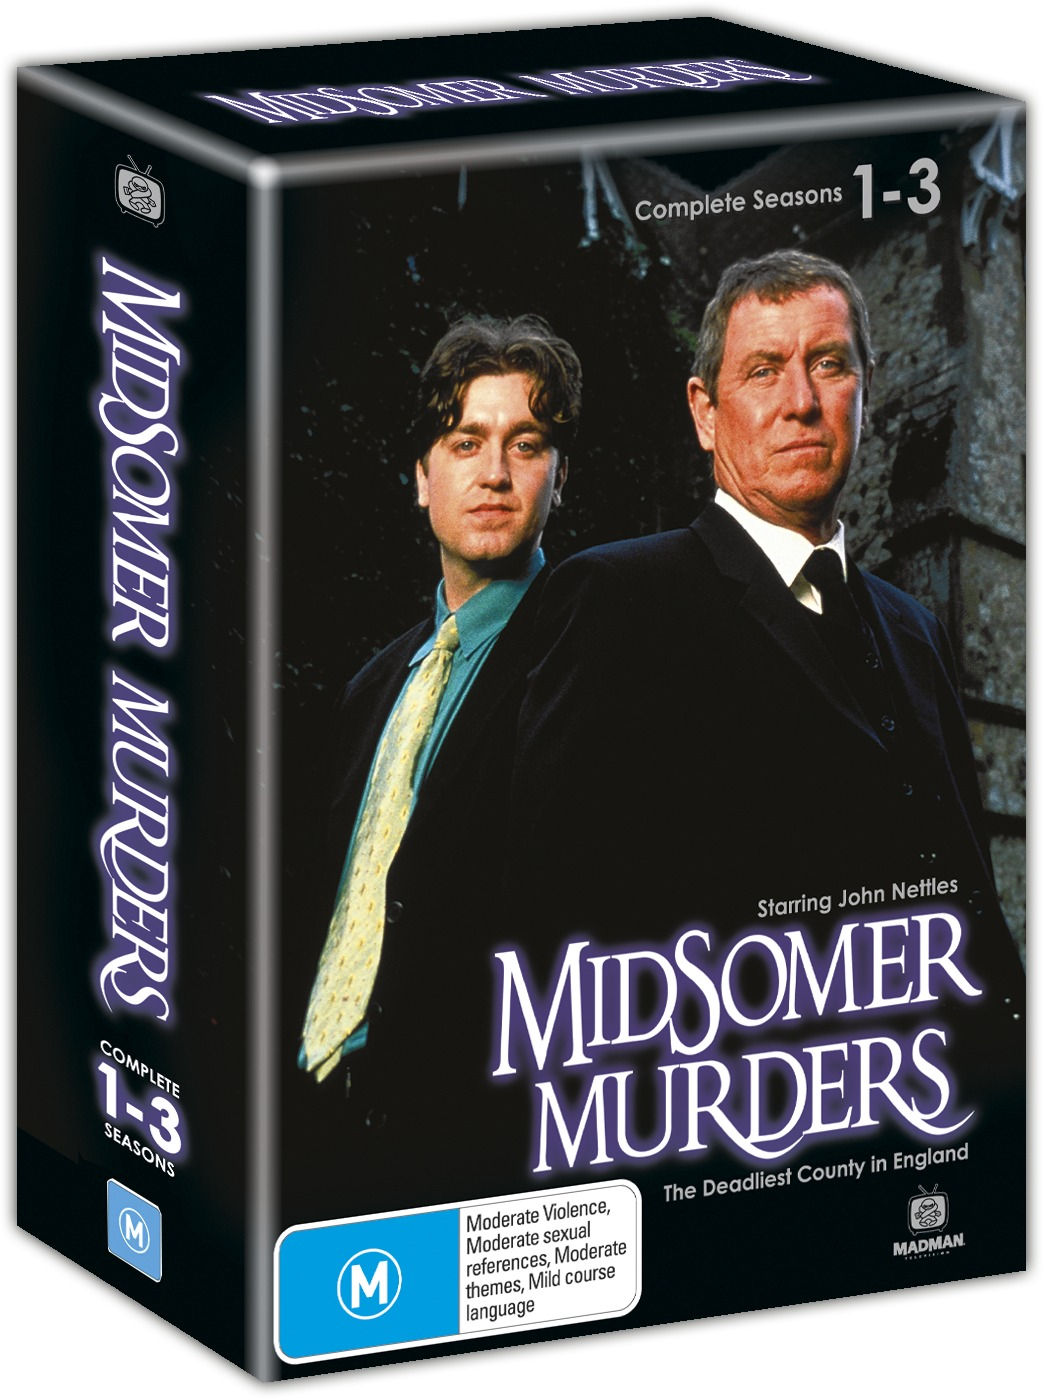 Midsomer Murders - Complete Seasons 1-3 Box Set on DVD image